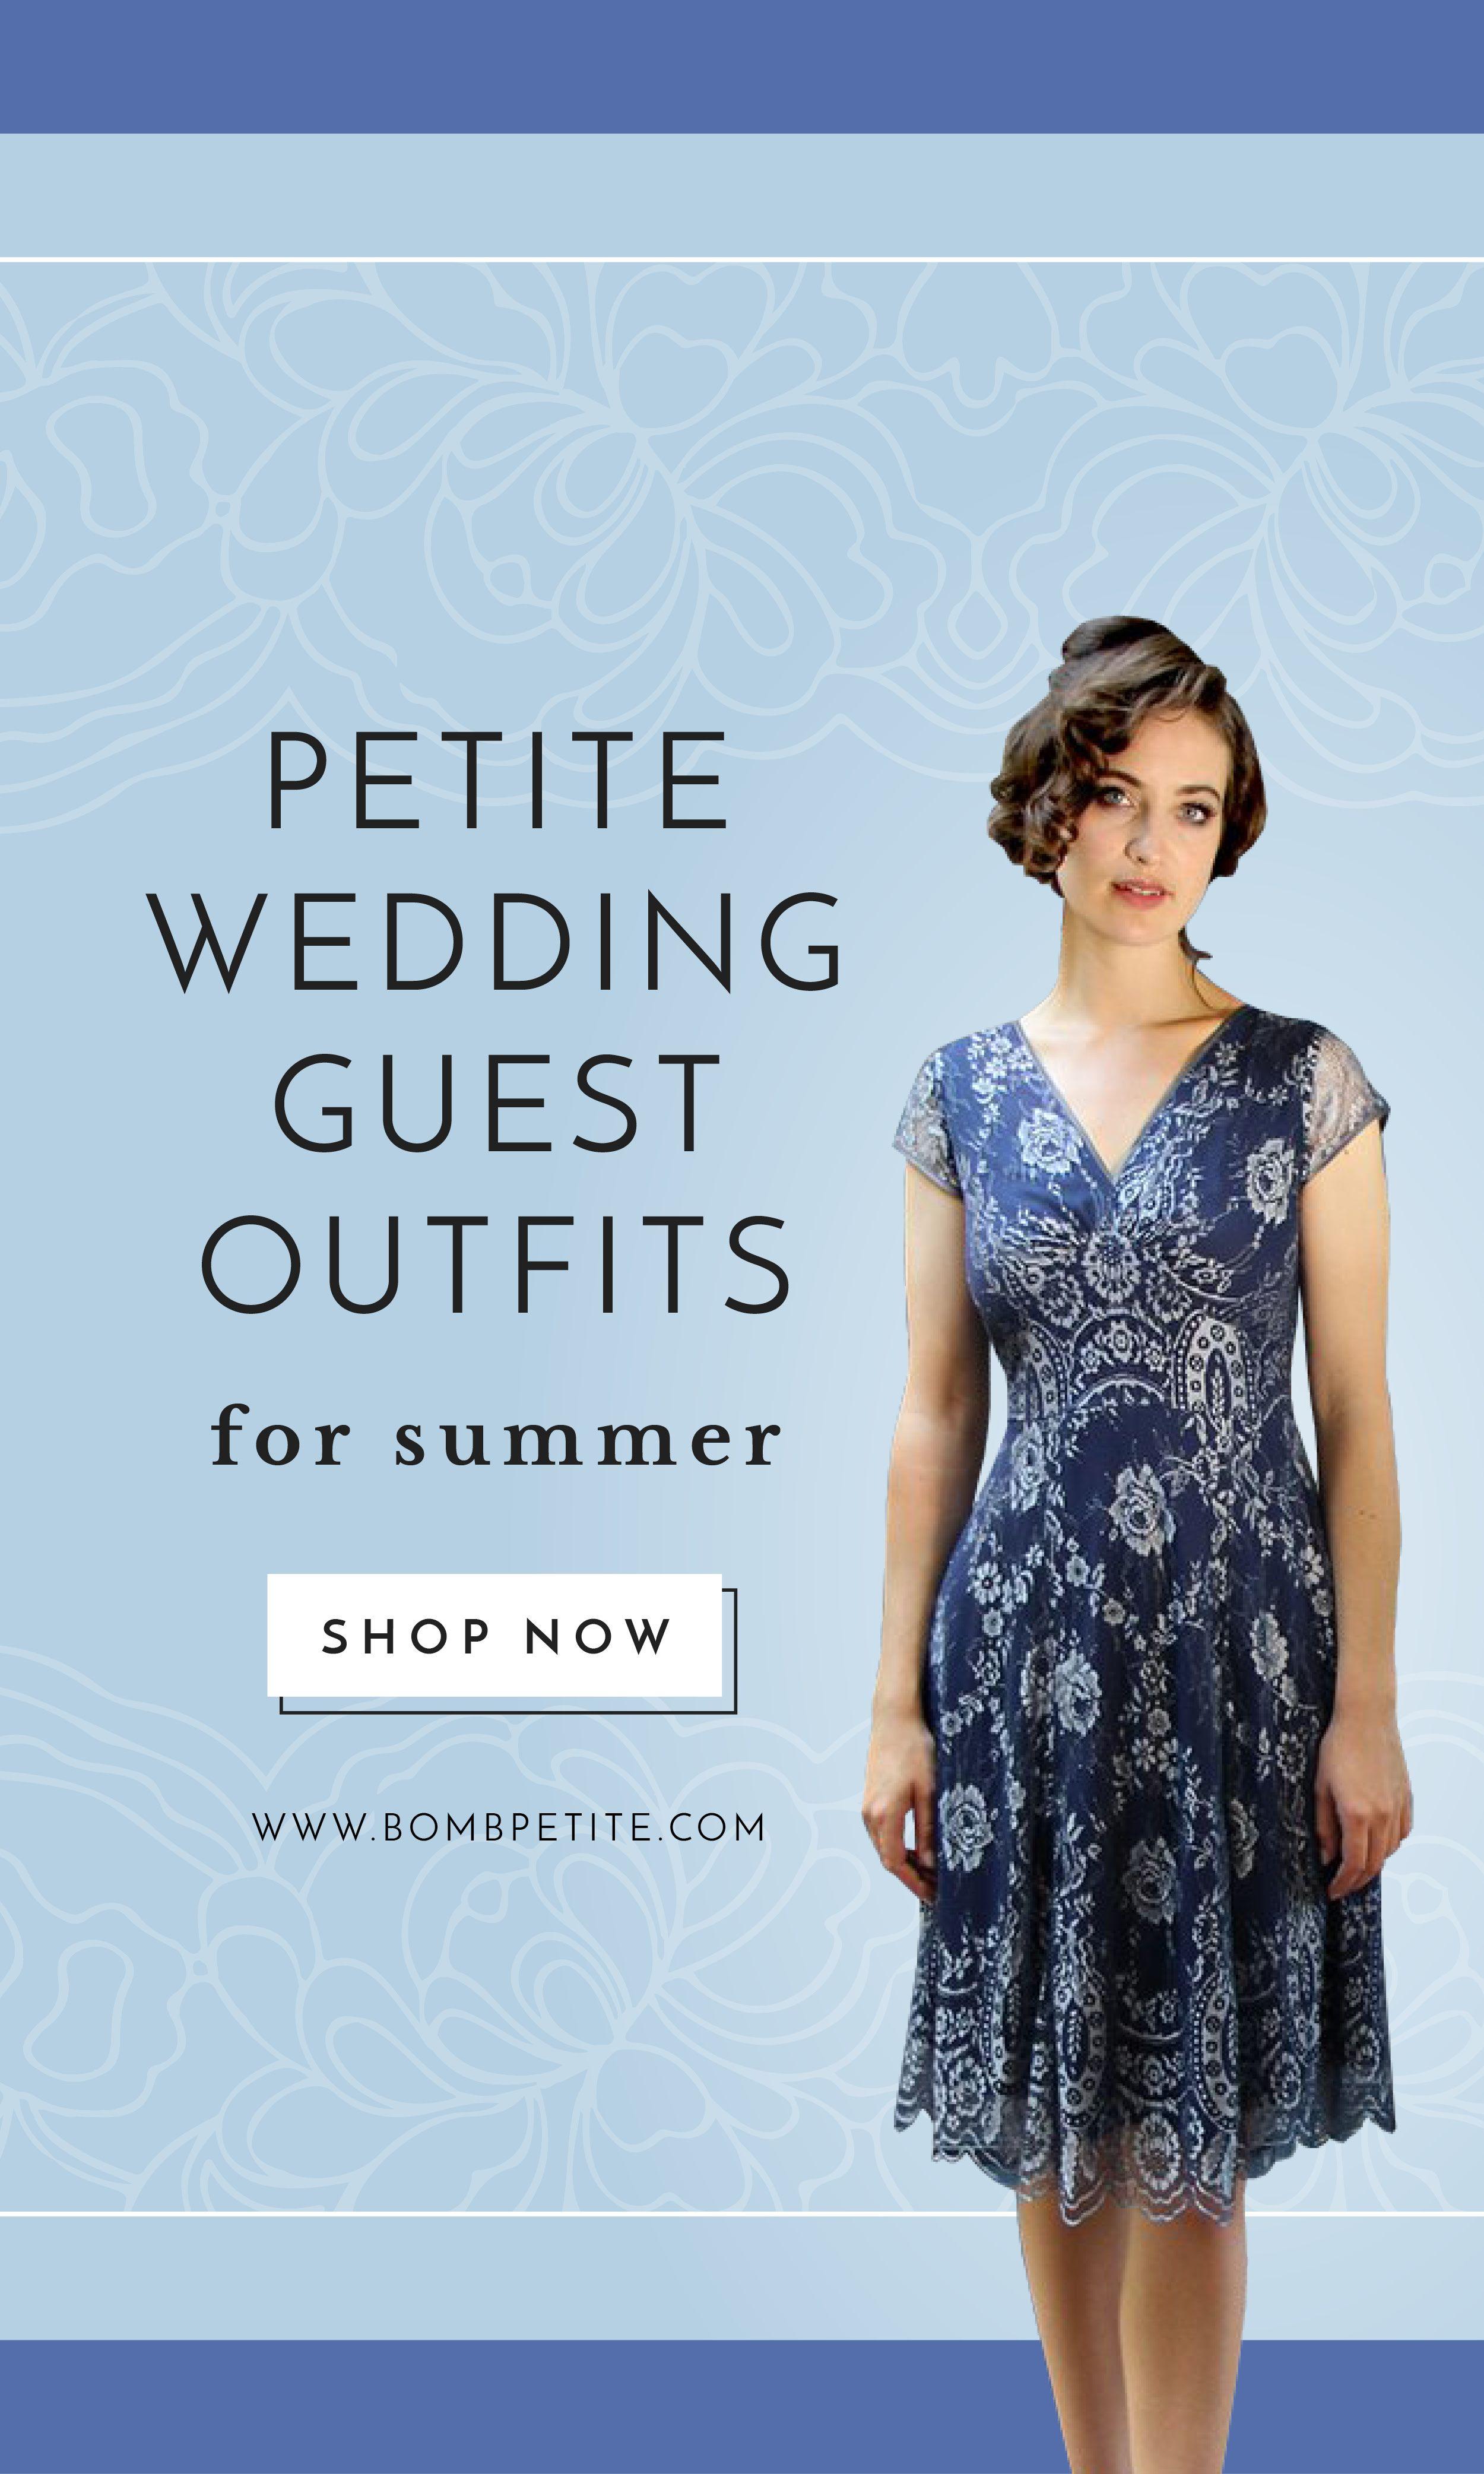 Petite Wedding Guest Dresses Bomb Petite Petite Wedding Guest Outfits Petite Wedding Guest Dresses Petite Wedding Dress [ 4167 x 2500 Pixel ]